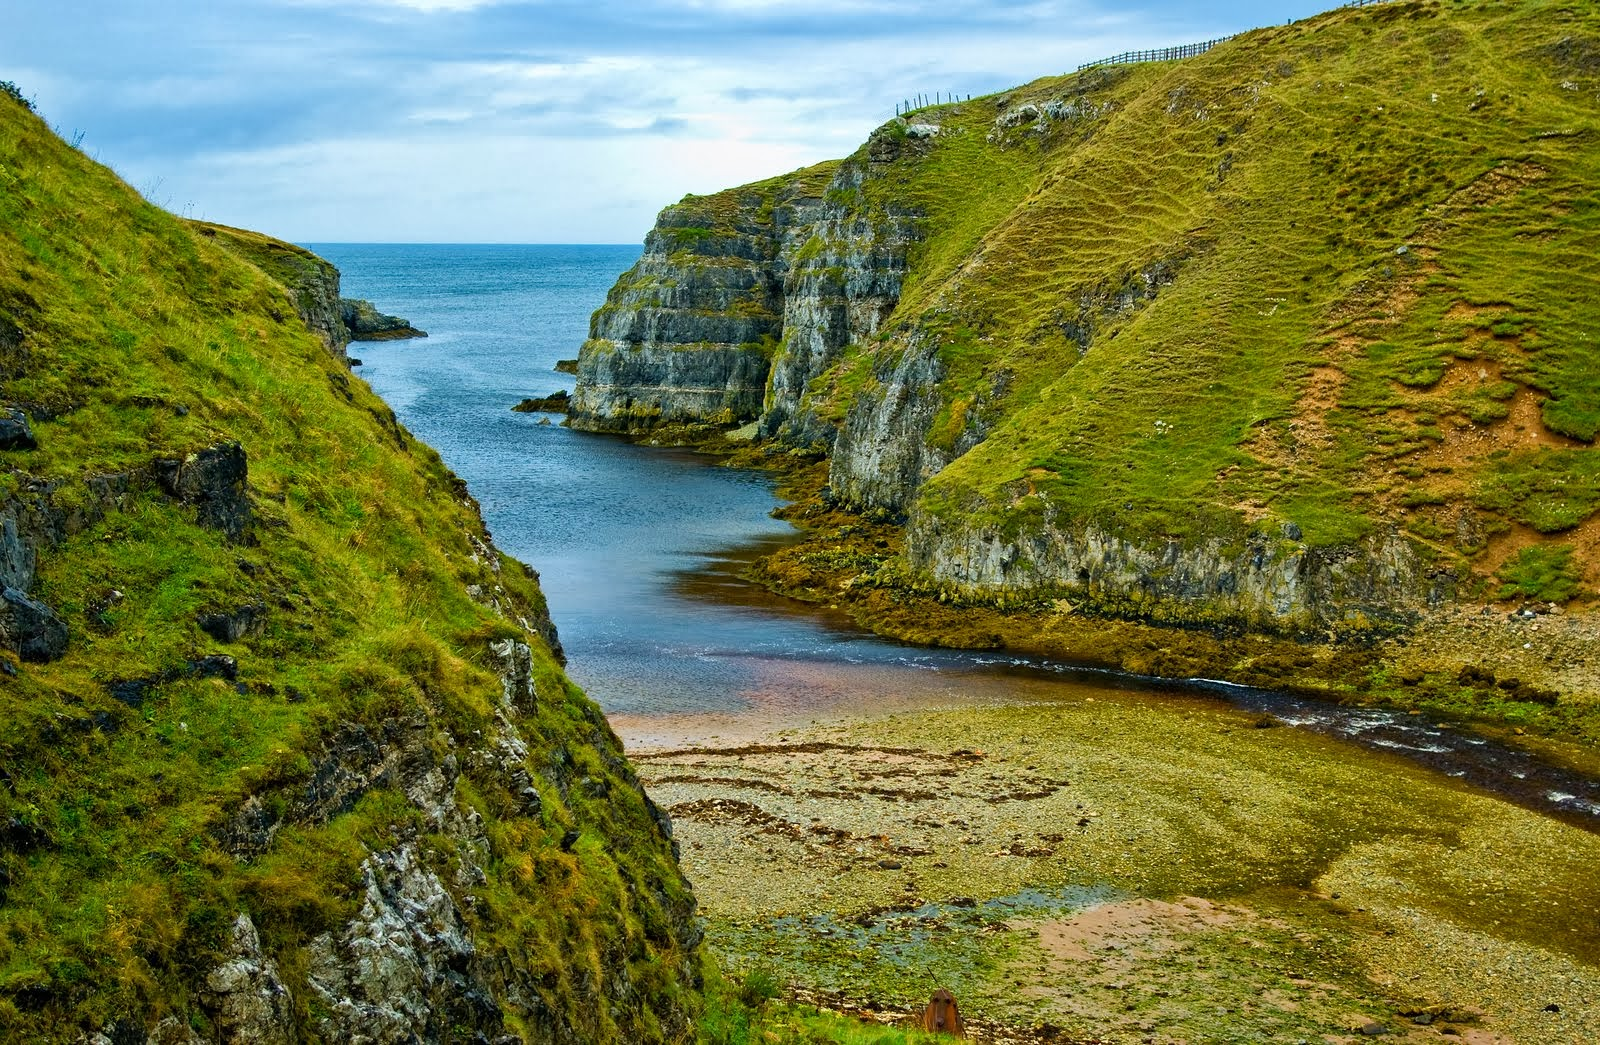 Vacation Inspiration # 454 - Scotland